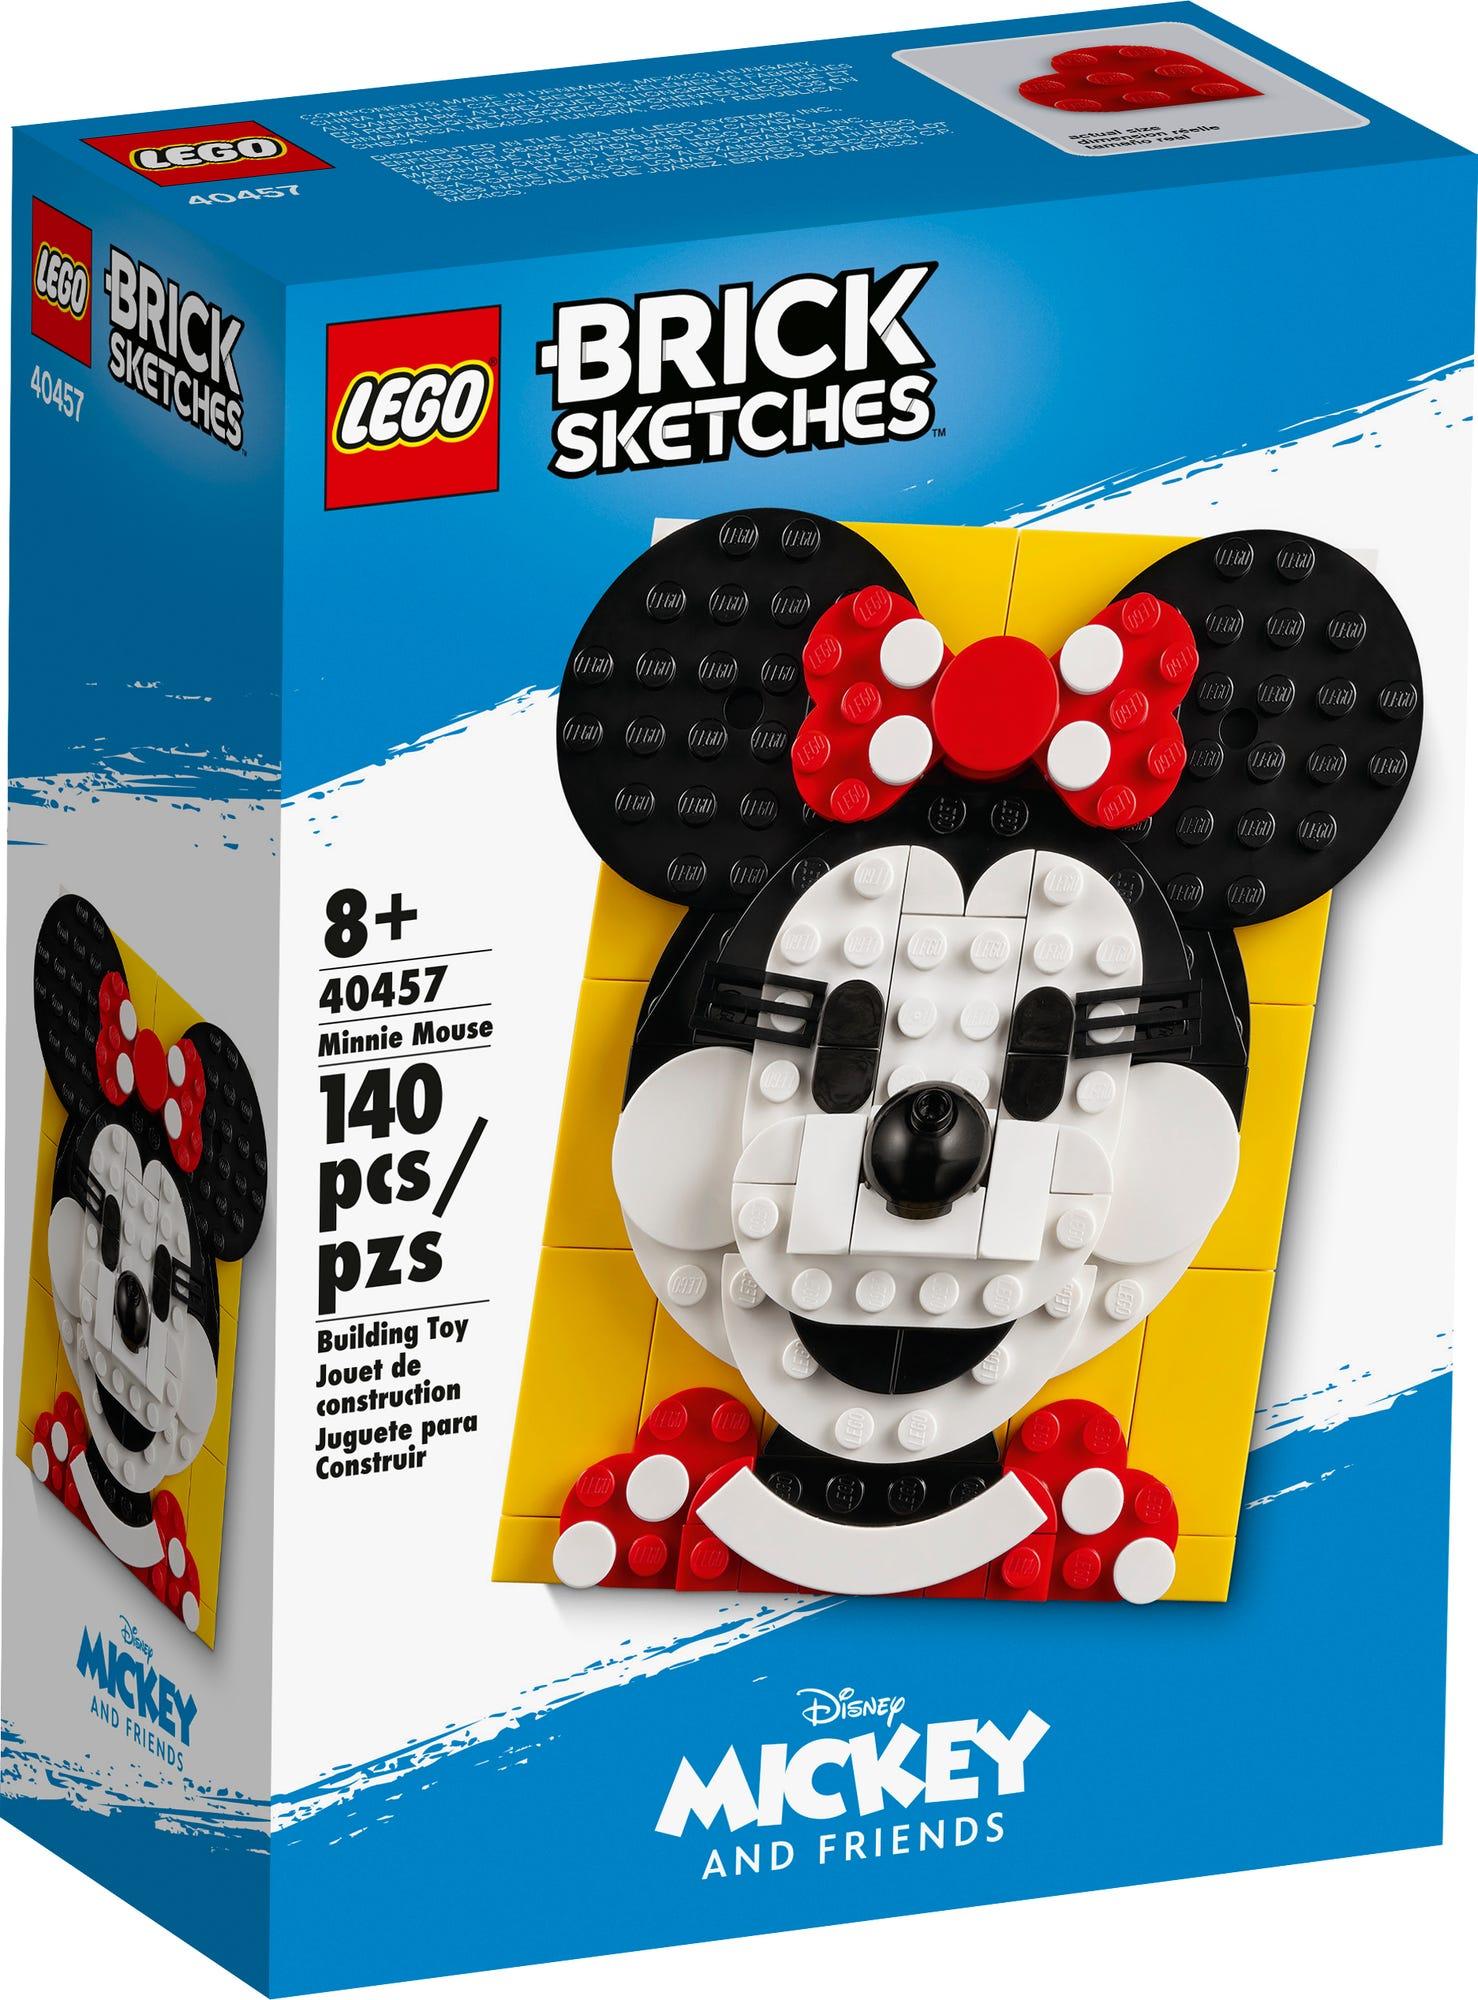 LEGO Brick Sketches 40457 Minnie Mouse (2)